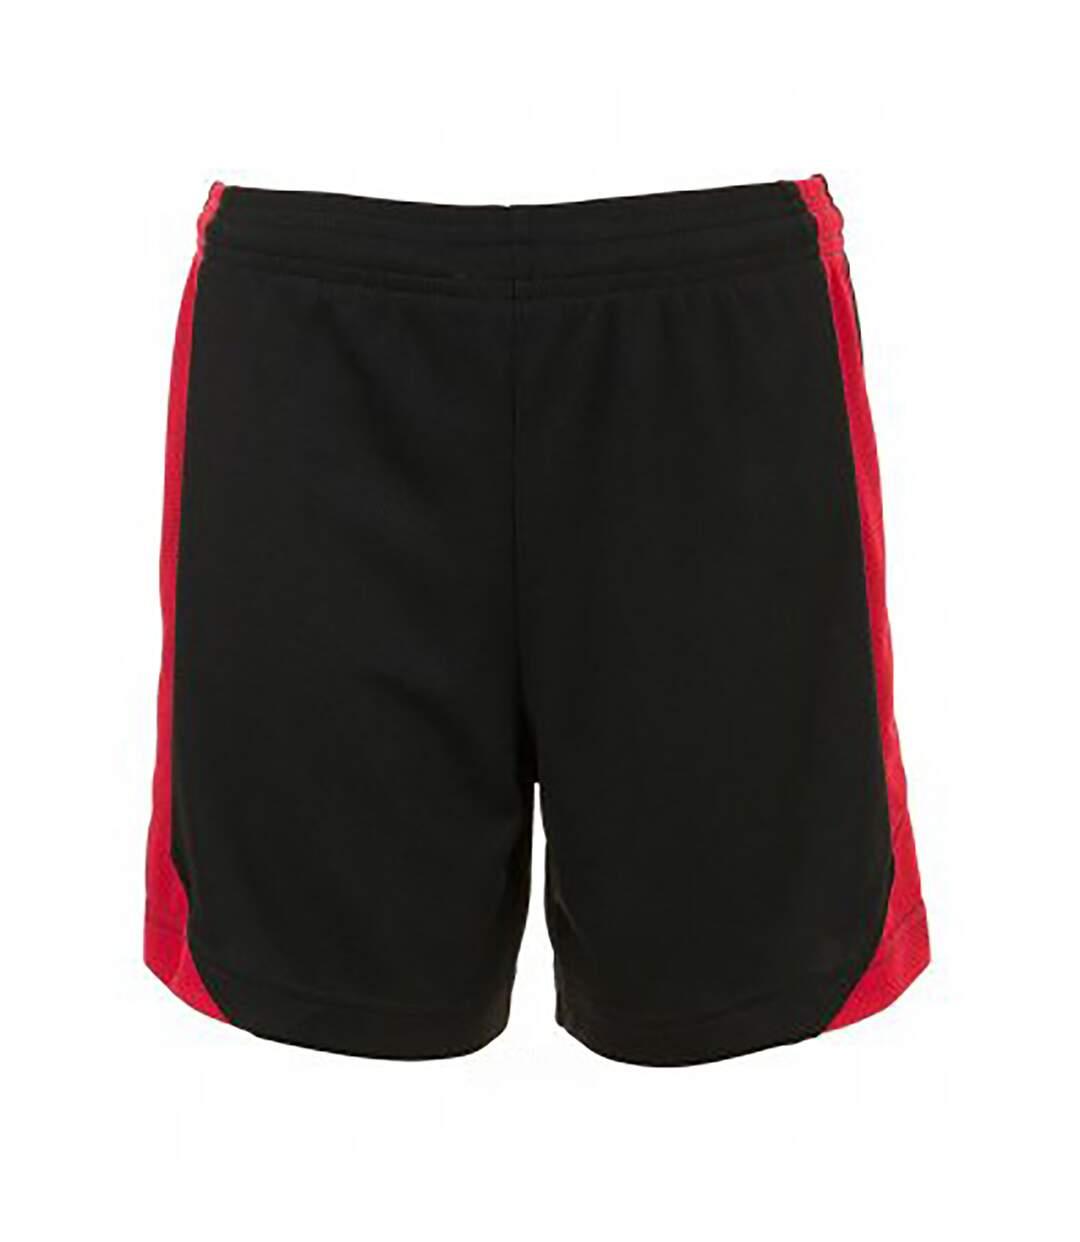 SOLS Mens Olimpico Football Shorts (Black/Red) - UTPC2788